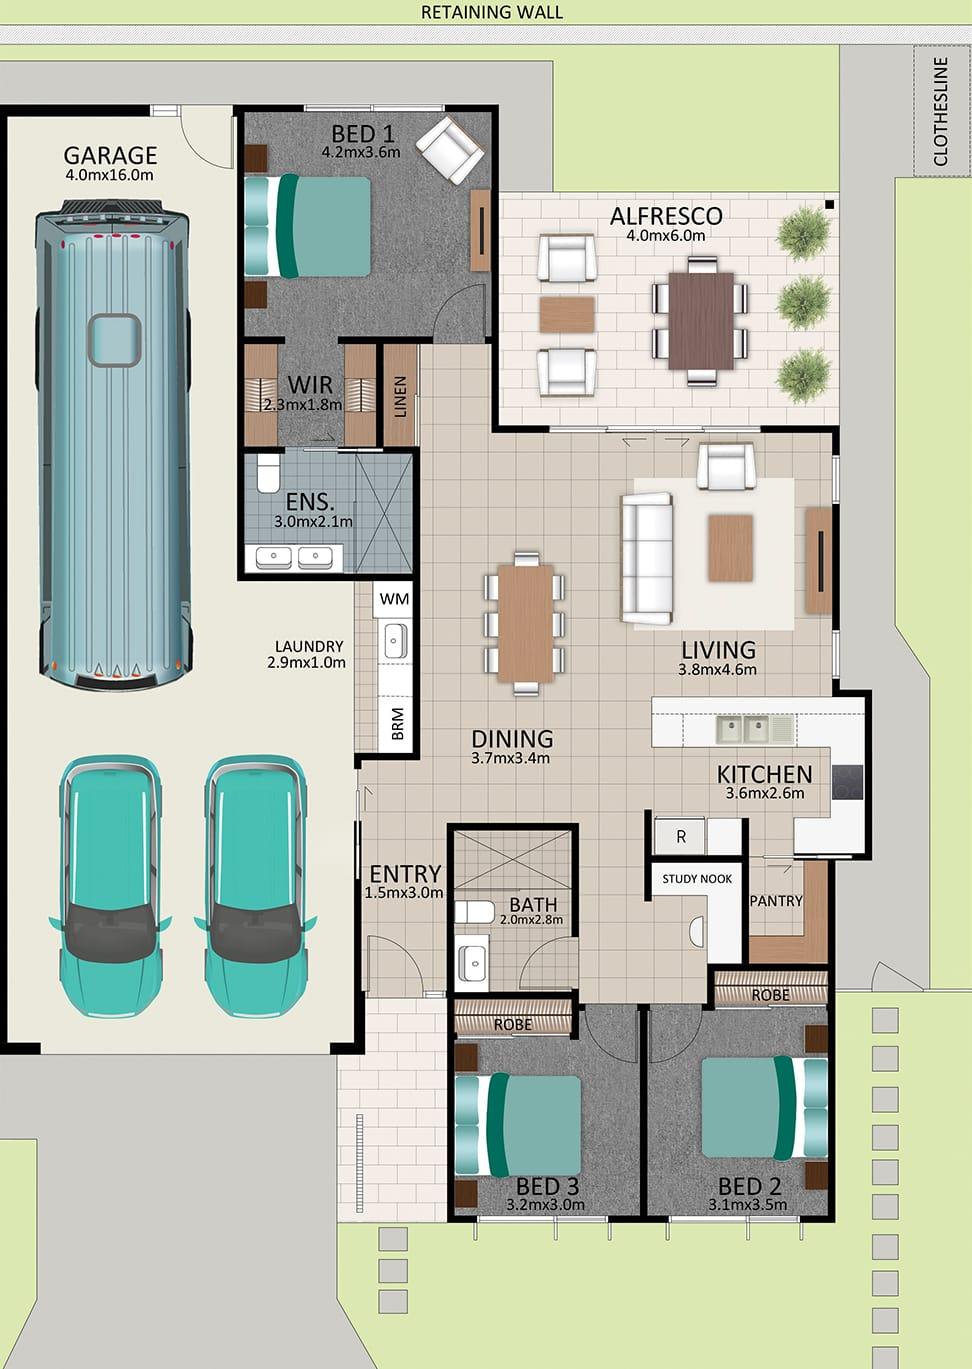 LAT25 Floorplan GAL OCT20 LOT 212 - Lot 212